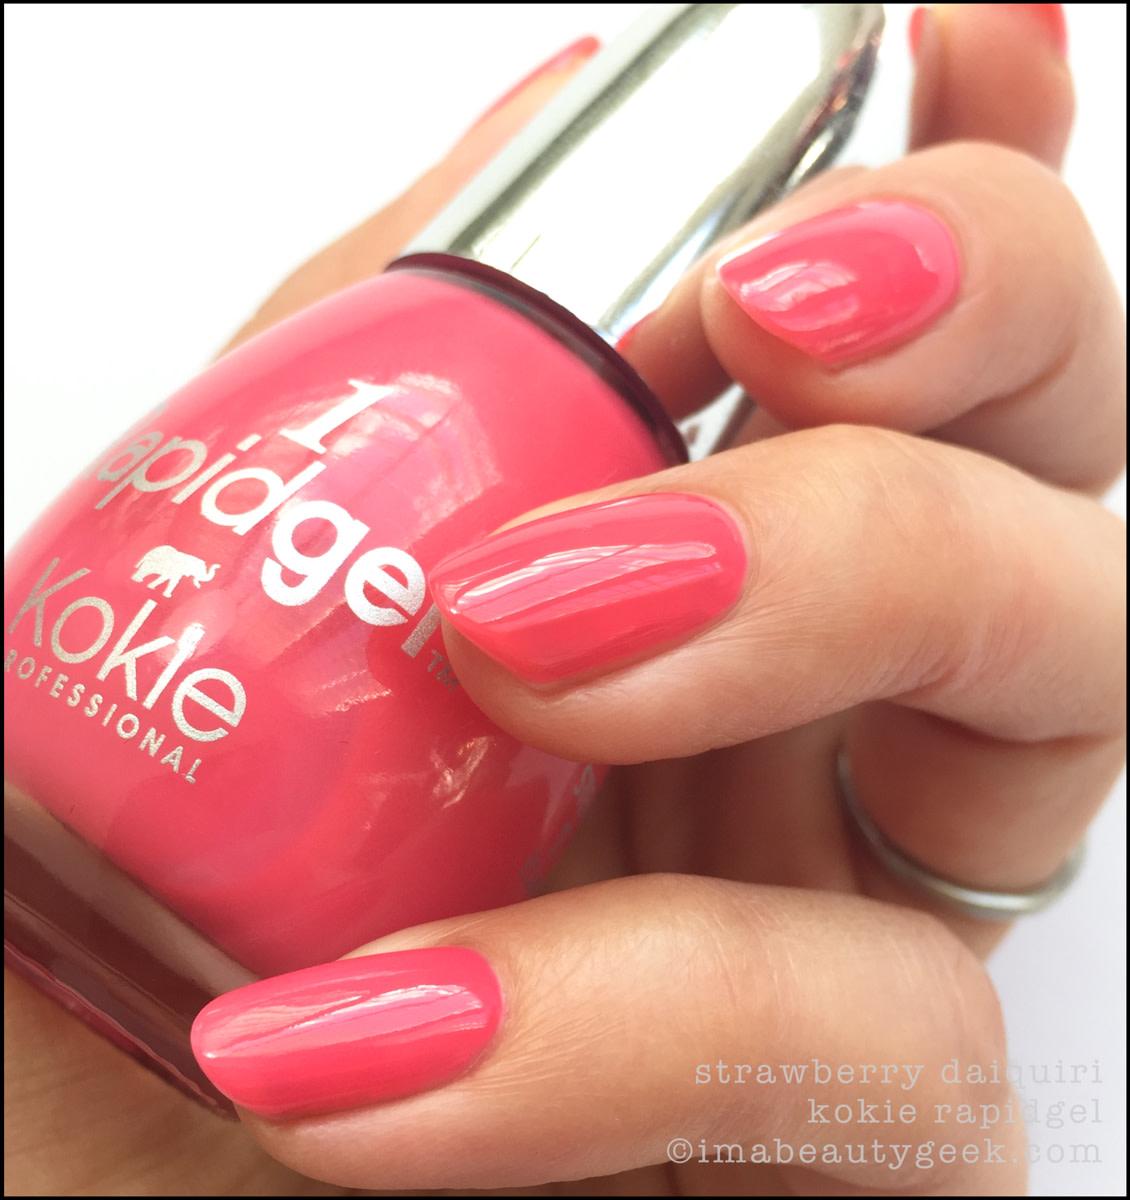 Kokie Nail Polish Strawberry Daiquiri_Kokie Nail Polish Swatches Review